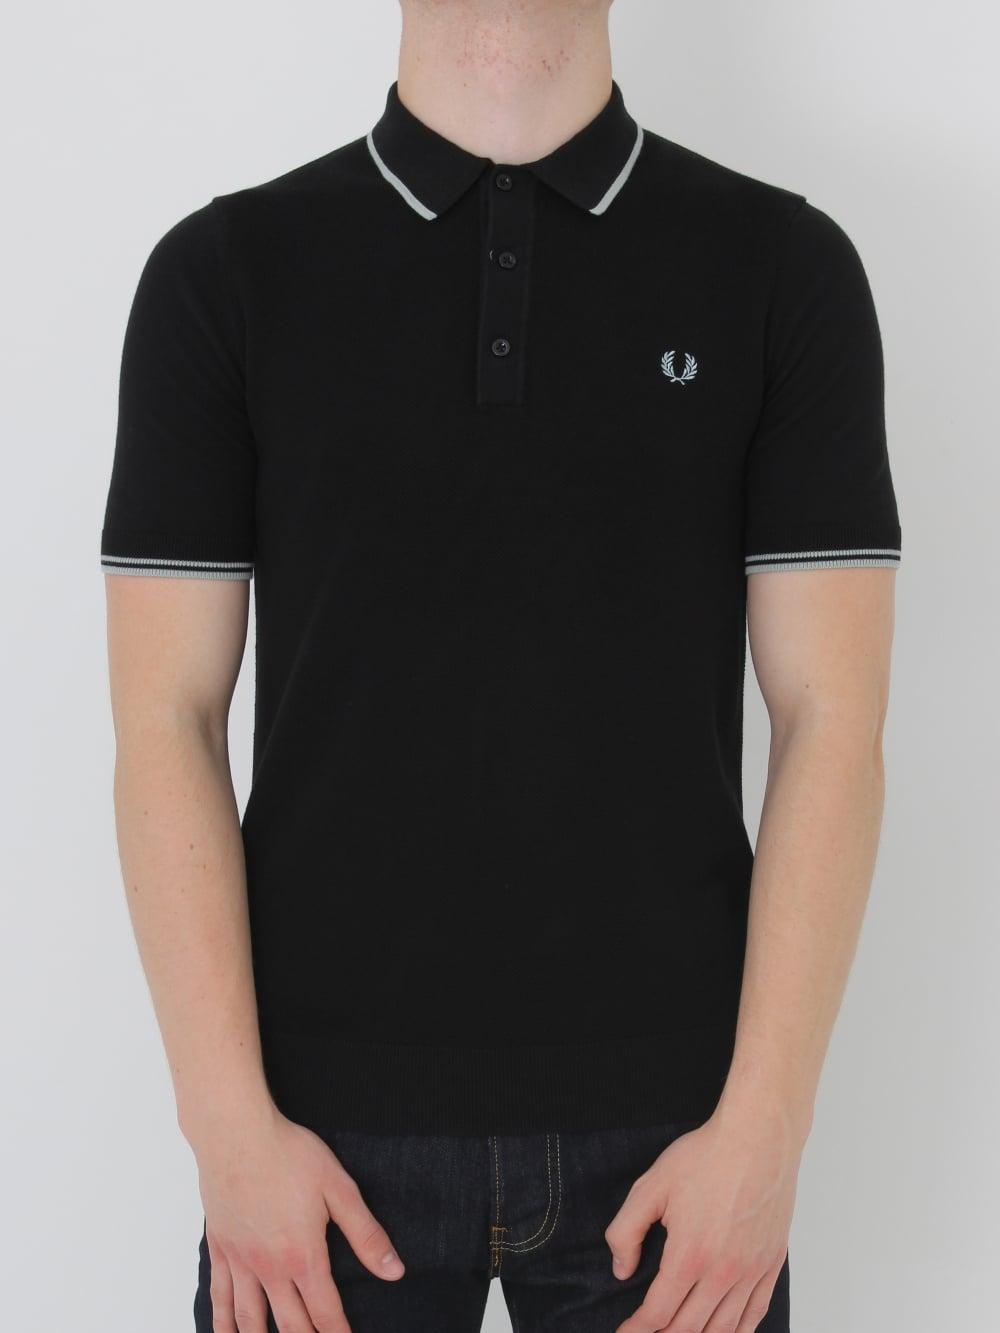 neue niedrigere Preise Entdecken Super Qualität Tipped Knitted Polo Shirt - Black